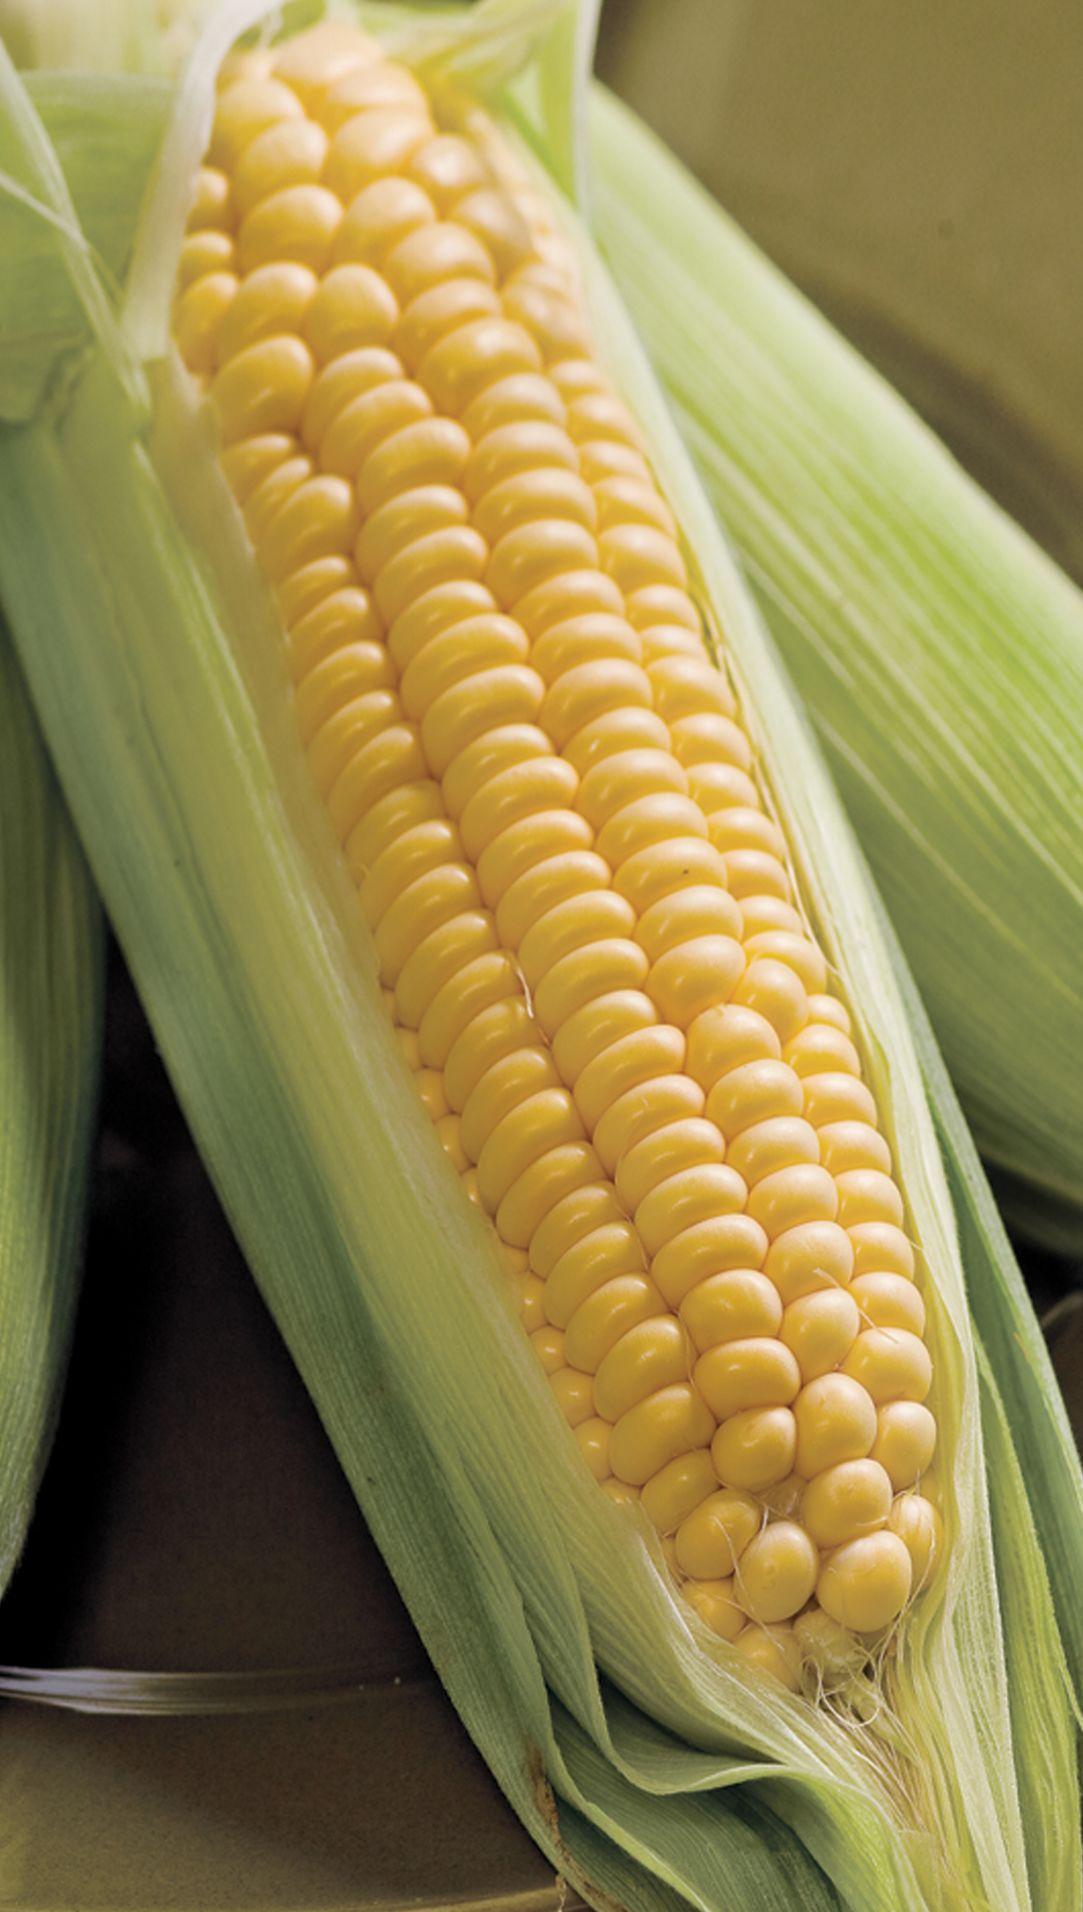 Are You afraid of GMO foods?